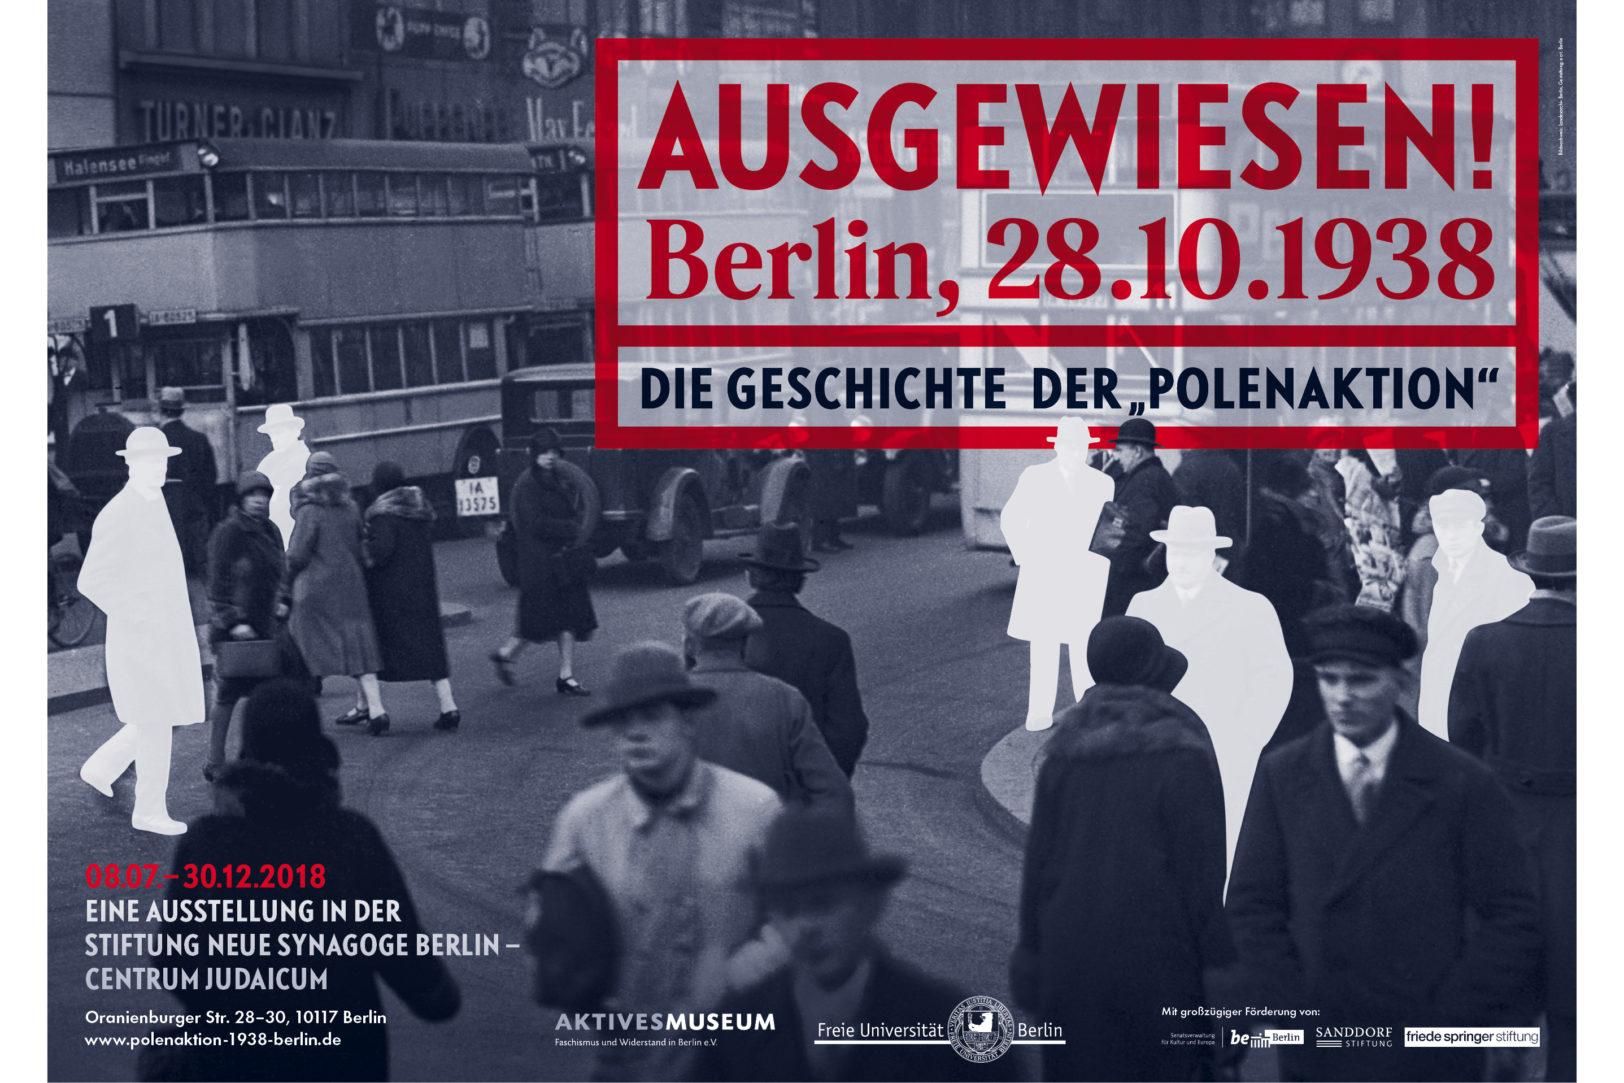 http://e-o-t.de/wordpress/wp-content/uploads/2019/04/eot-PA-Poster.jpg